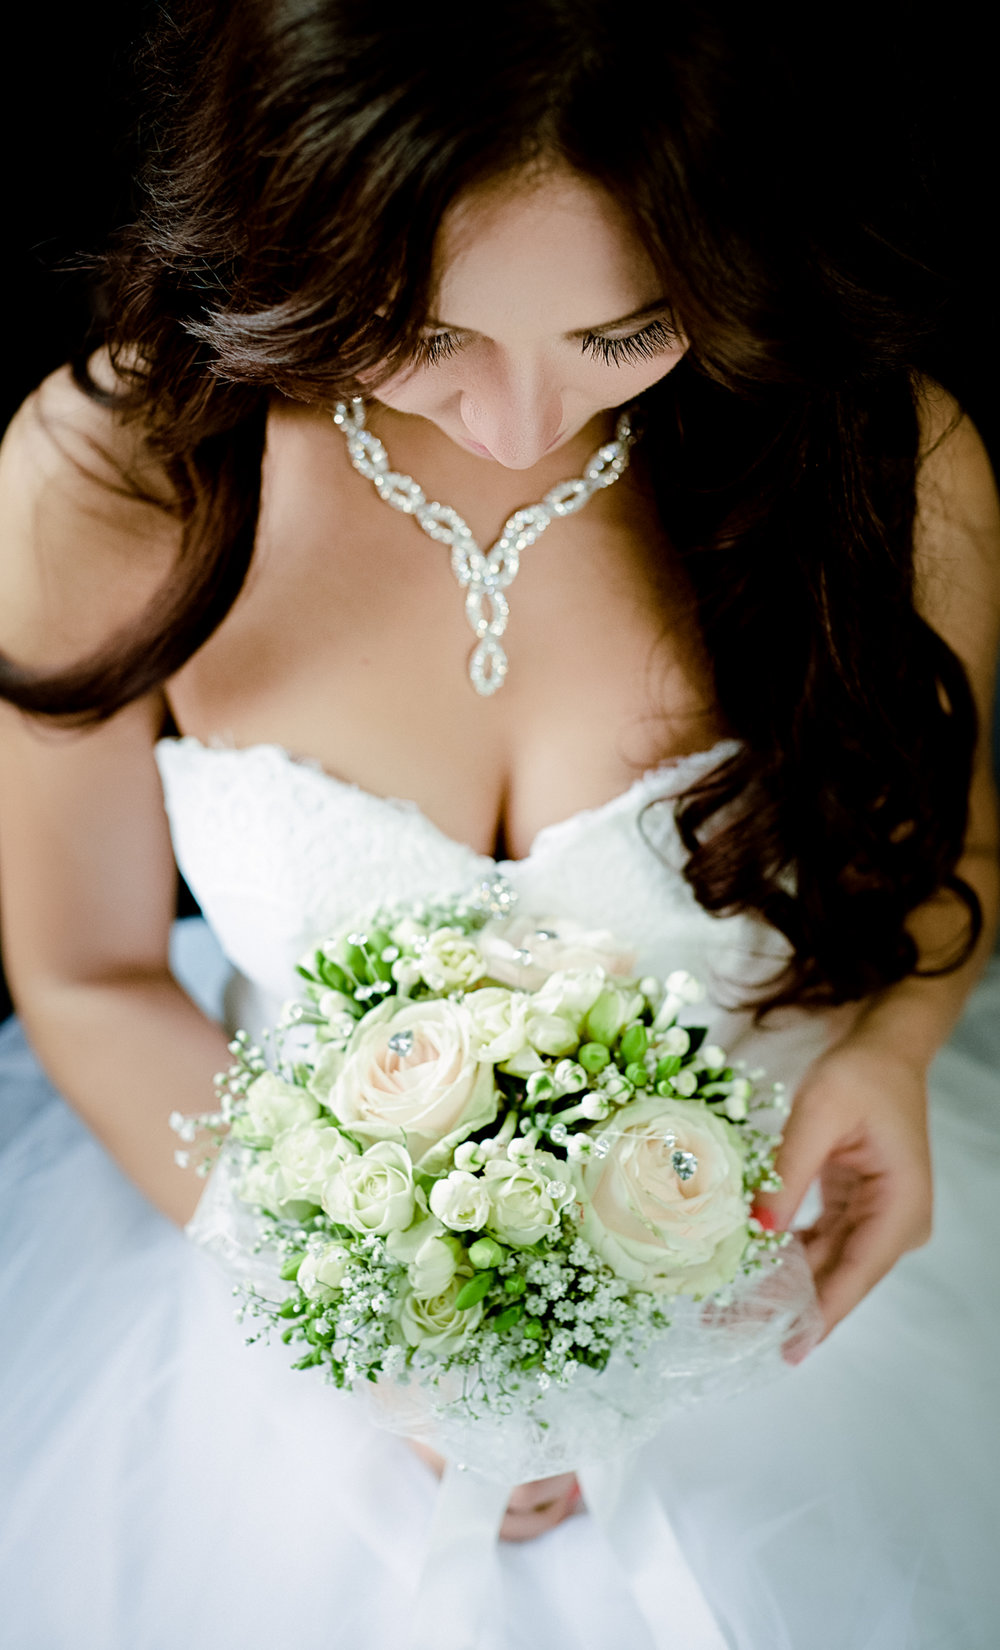 9D8A0395-116-Kamal Mostofi-Ricky-Wedding_Marija.jpg